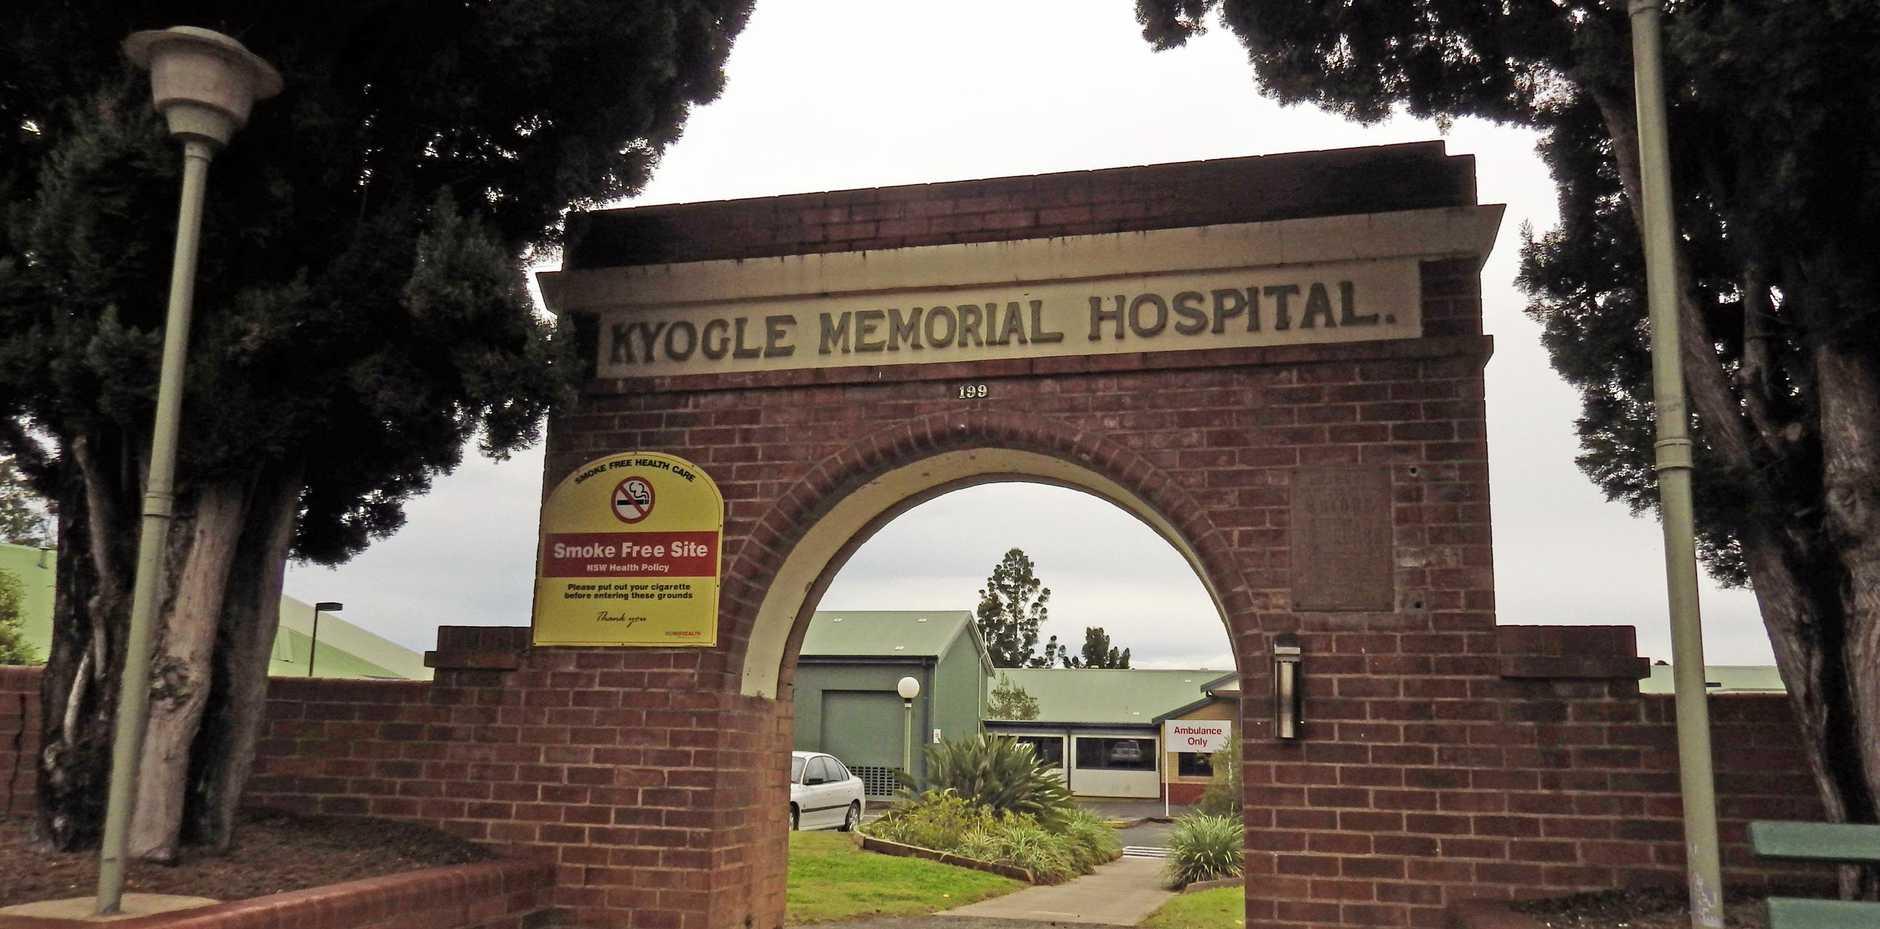 Kyogle Memorial Hospital.